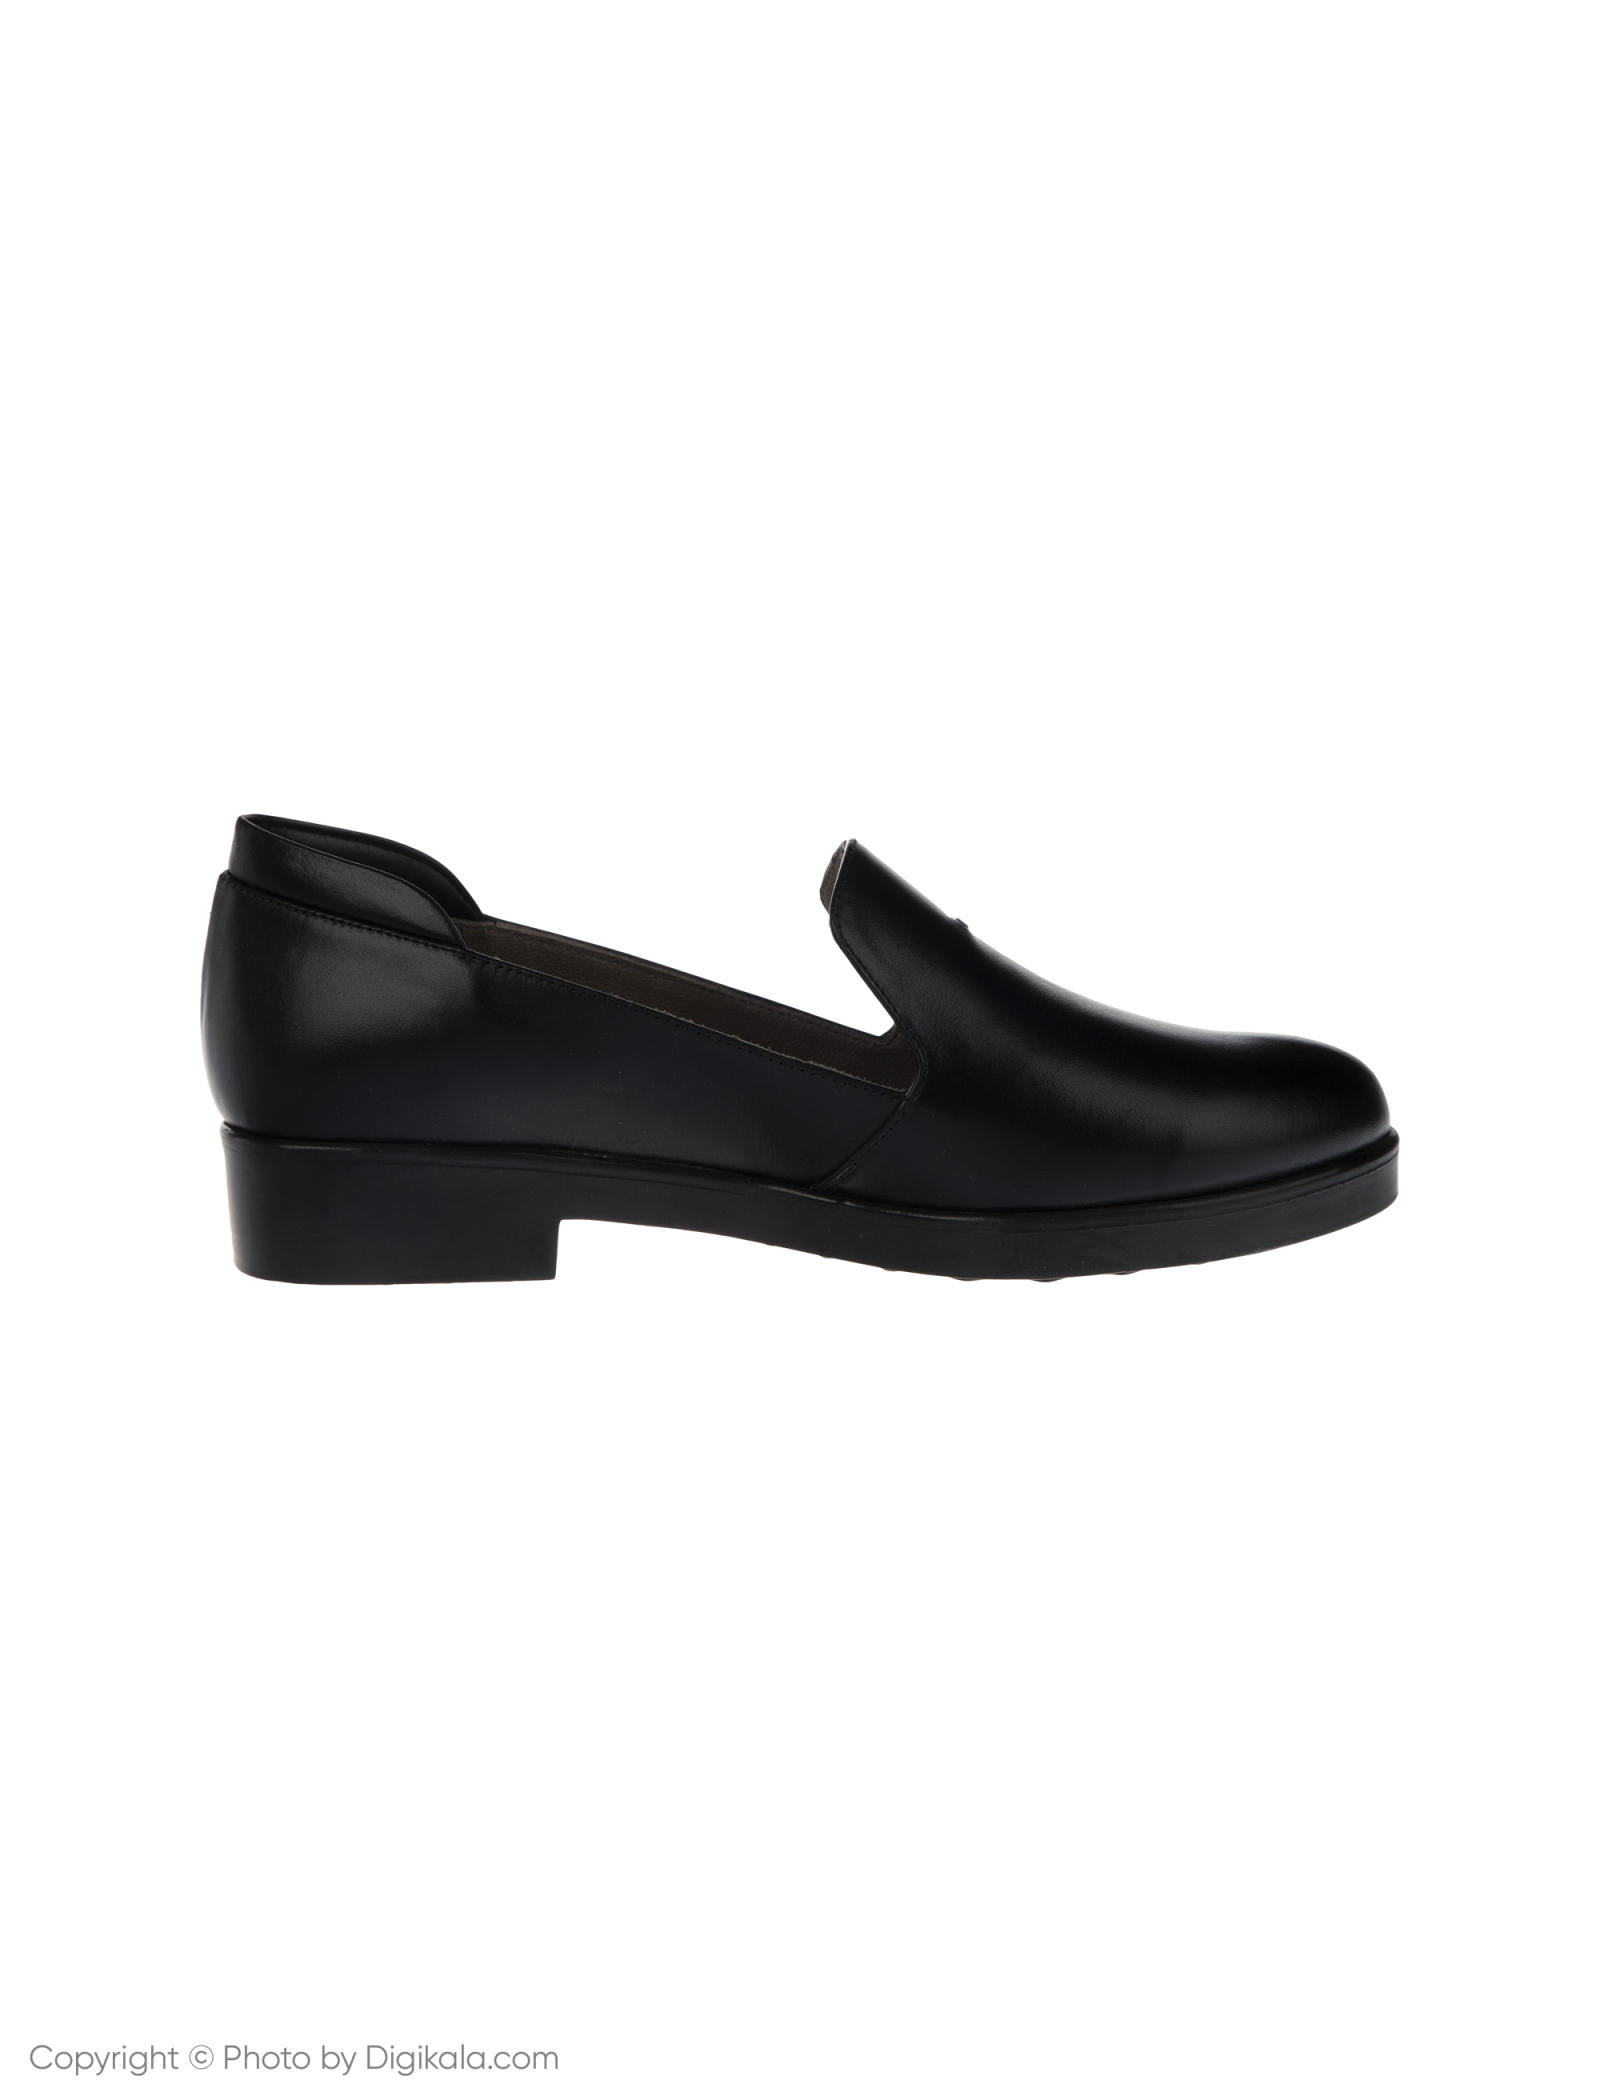 کفش روزمره زنانه شیفر مدل 5190A-101 -  - 2